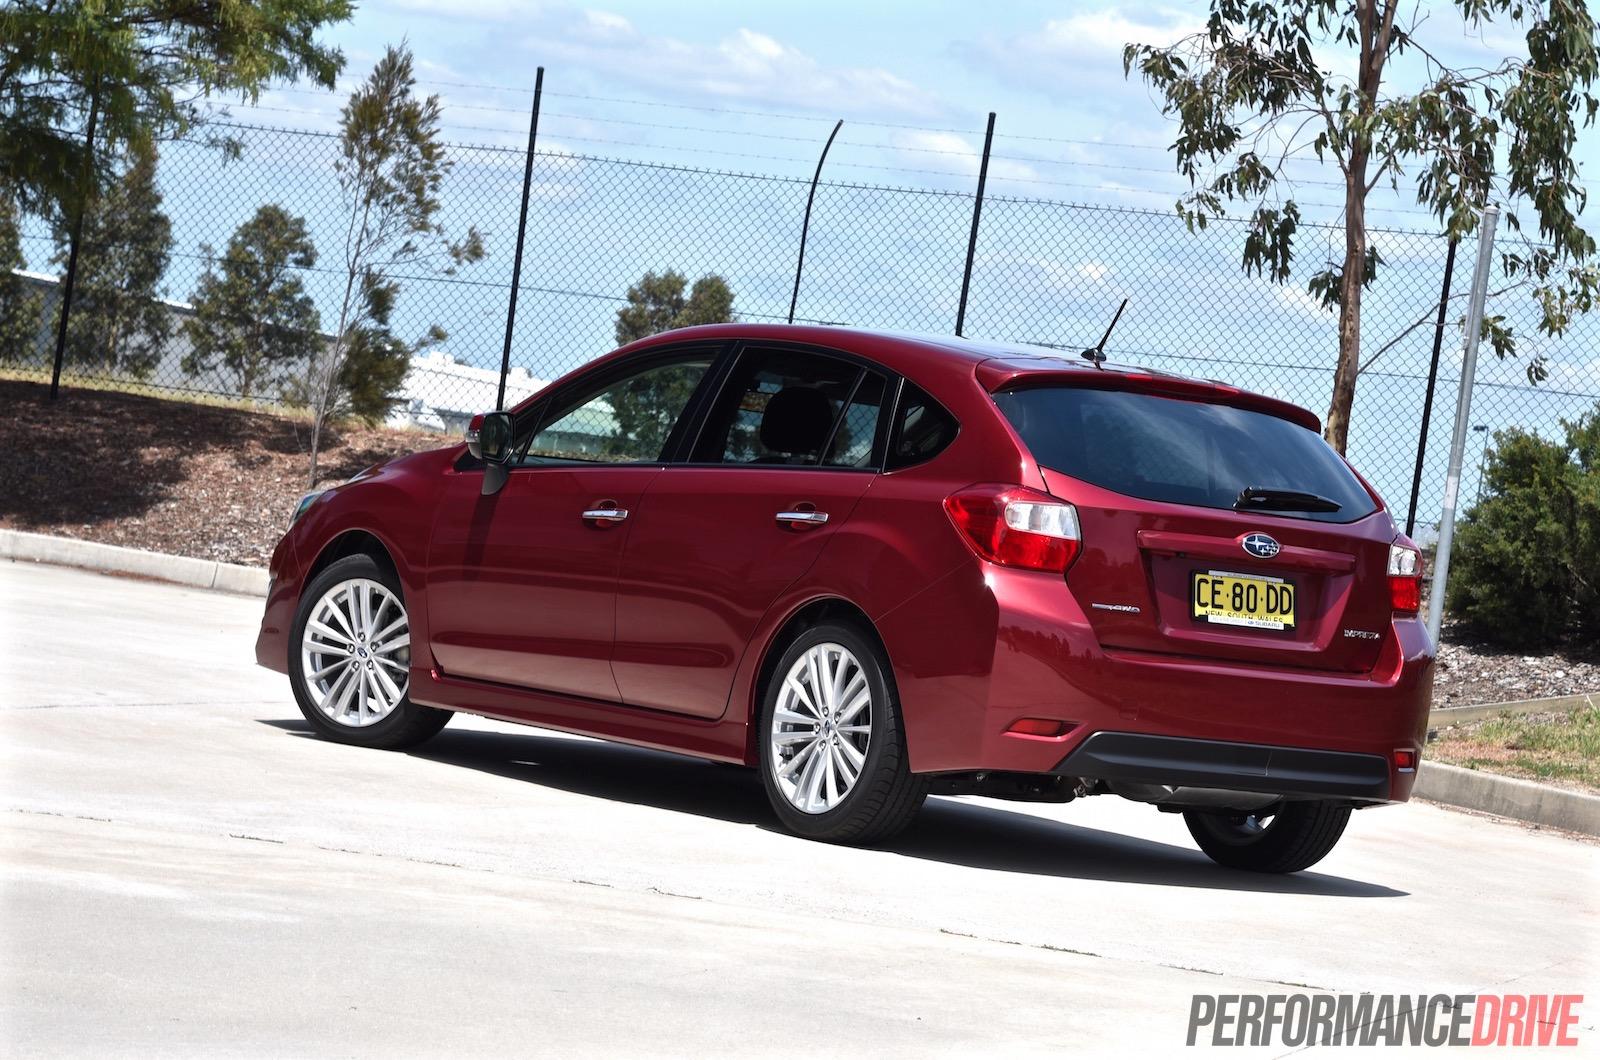 2015 Subaru Impreza 2 0i S Review Video Performancedrive